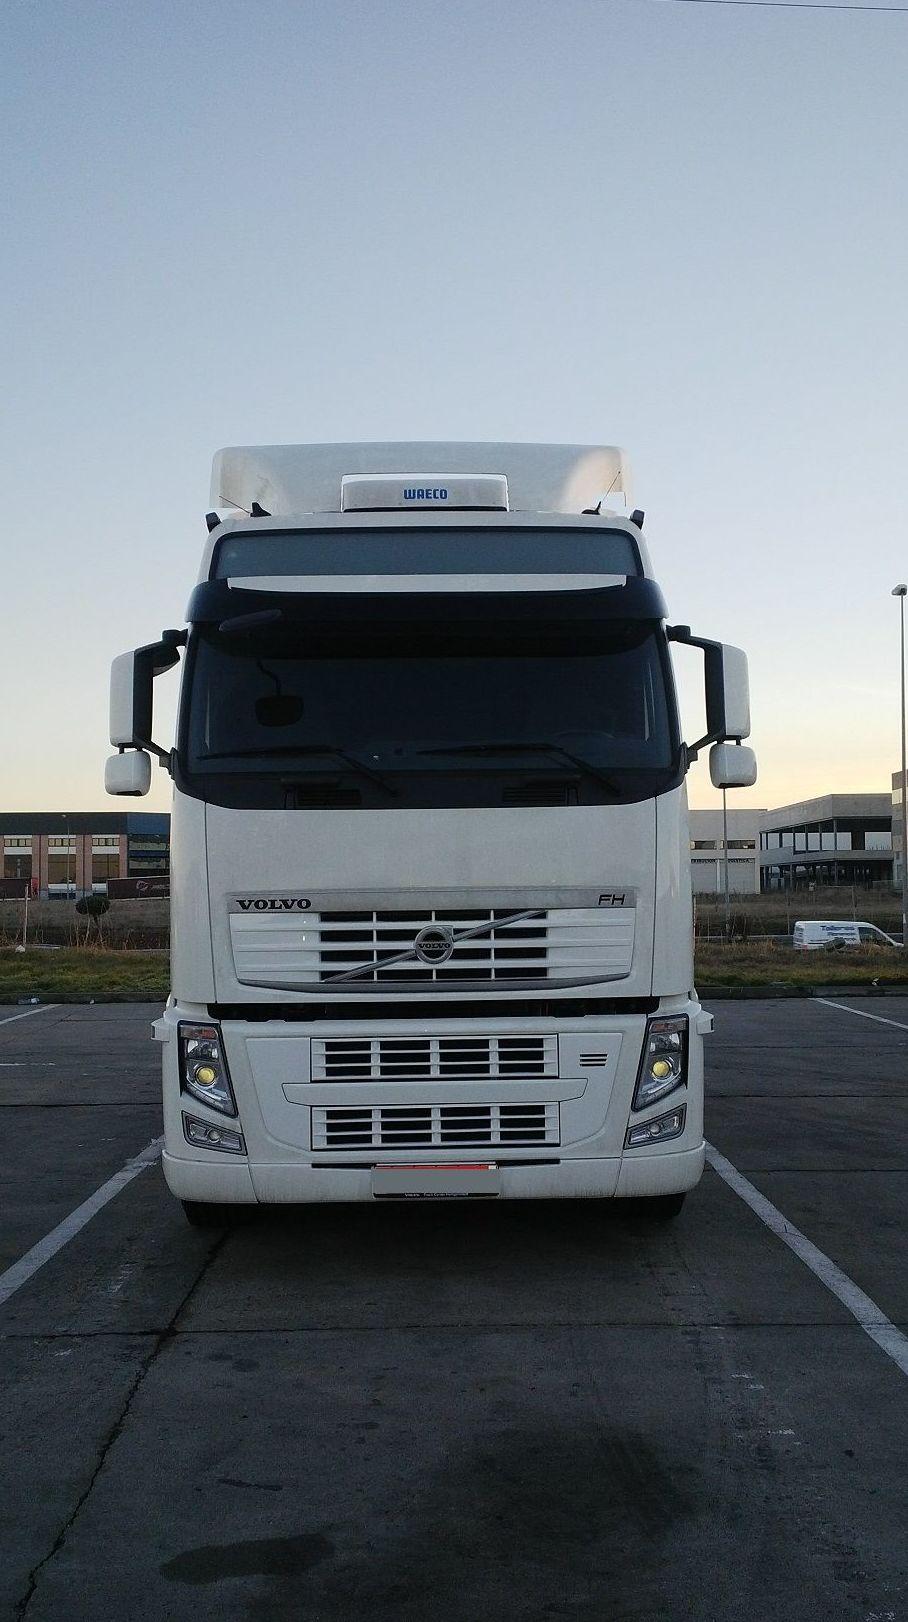 Foto 37 de Camiones en Villares de la Reina | Autotruck Salamanca